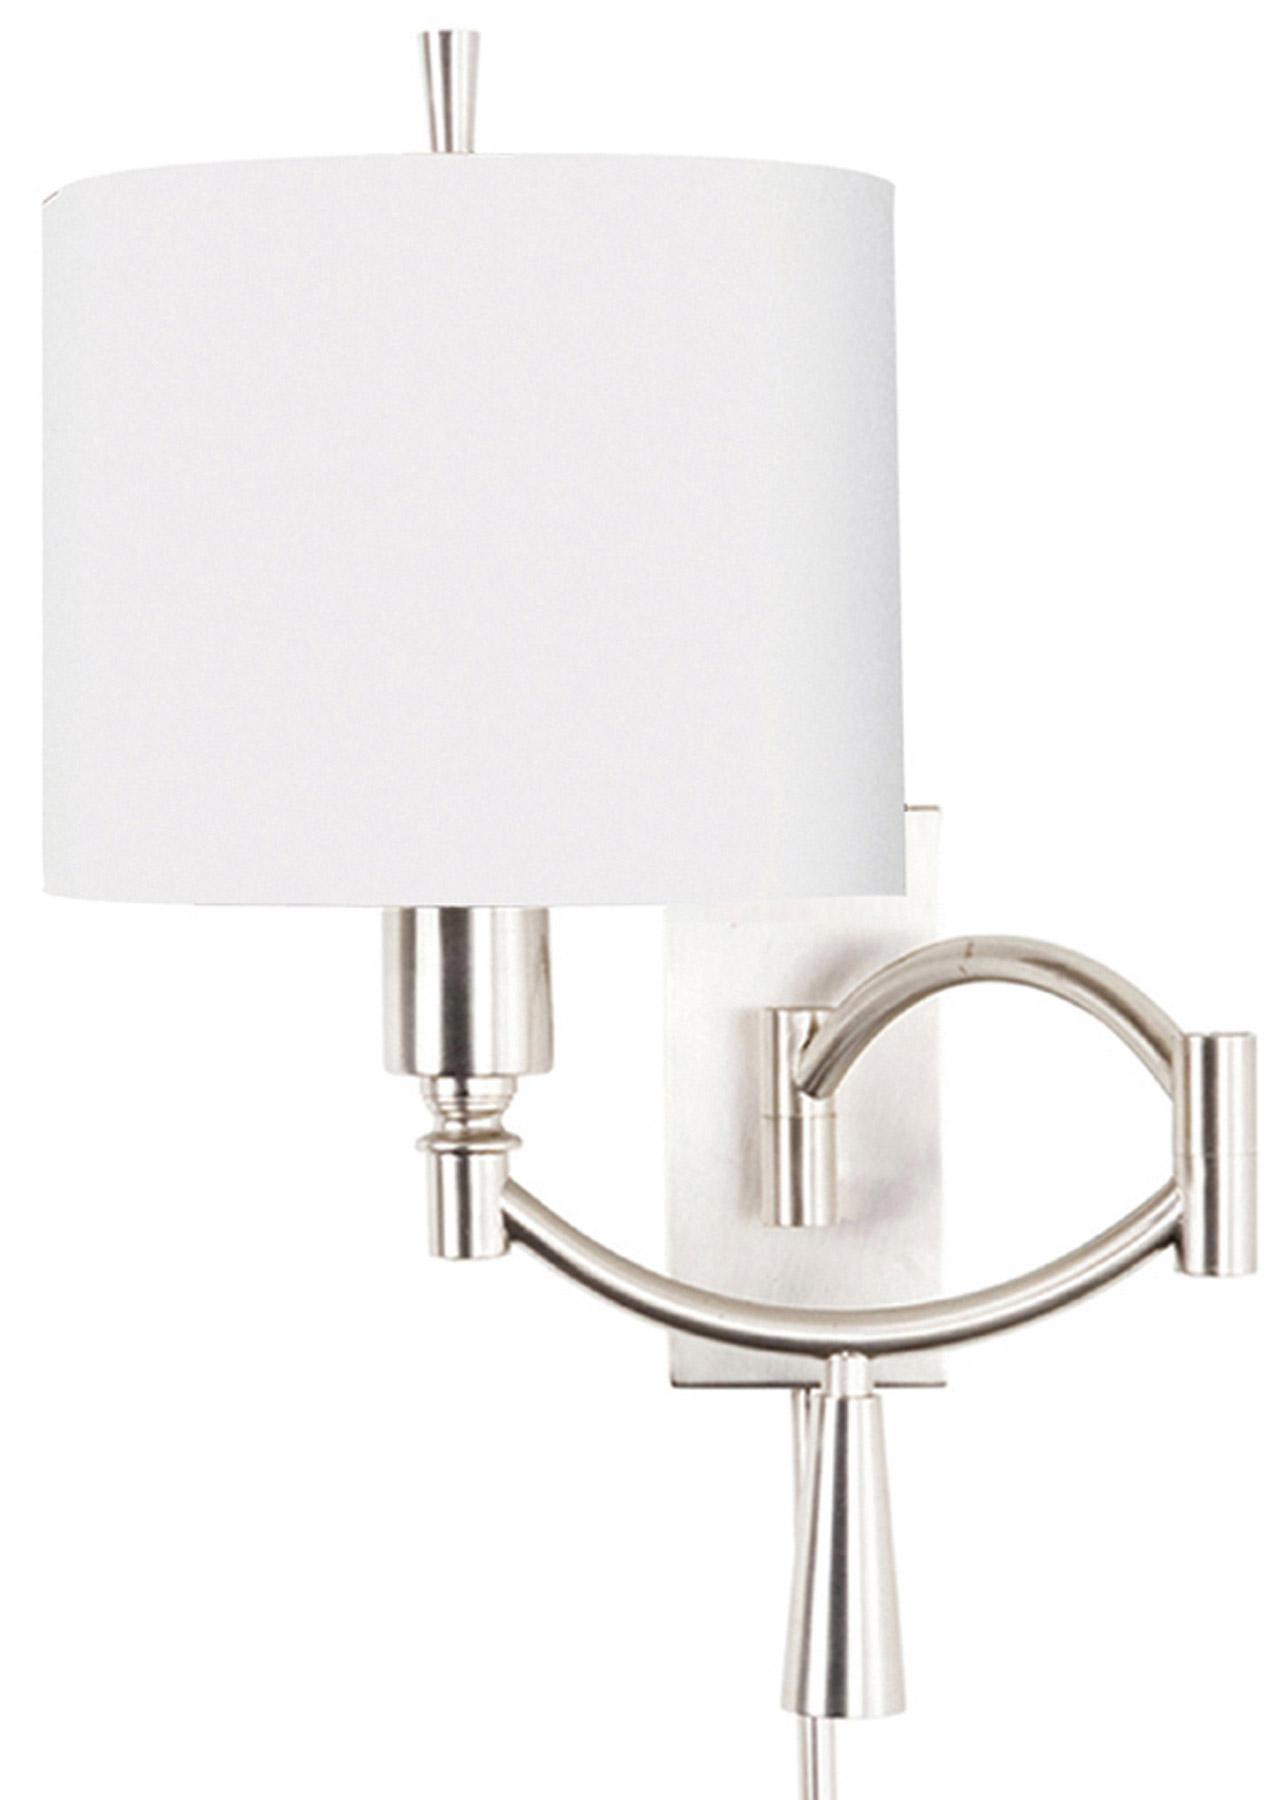 frederick cooper ra ii swing arm wall lamp